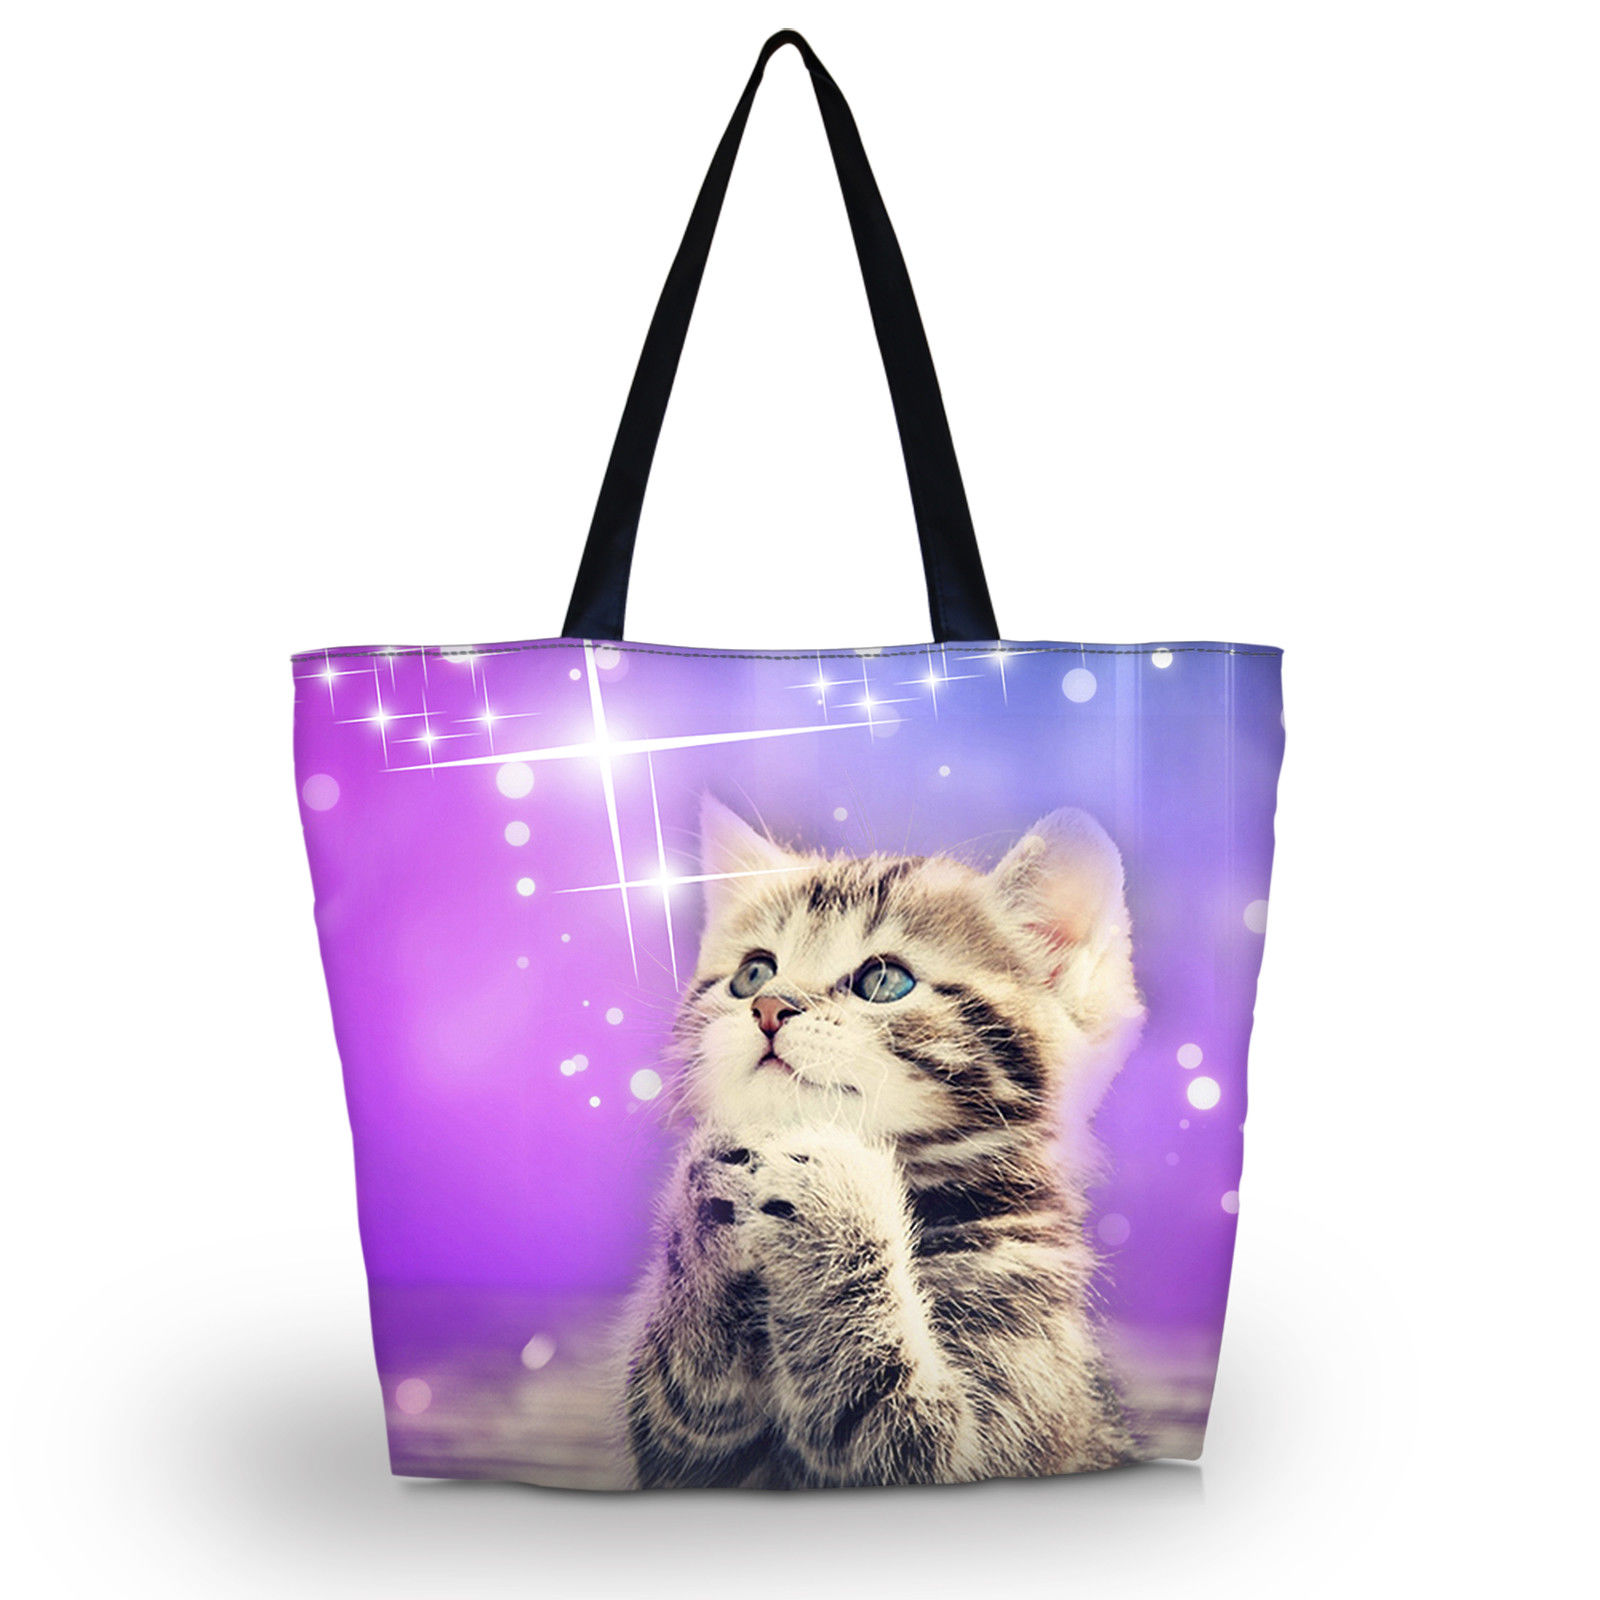 e68e31d0c9b ... Bags Casual Canvas  classic style 6b967 9d0ba 9.49 AUD - Cute Cat  Reusable Bag Tote Womens Shopping Bag Shoulder ...